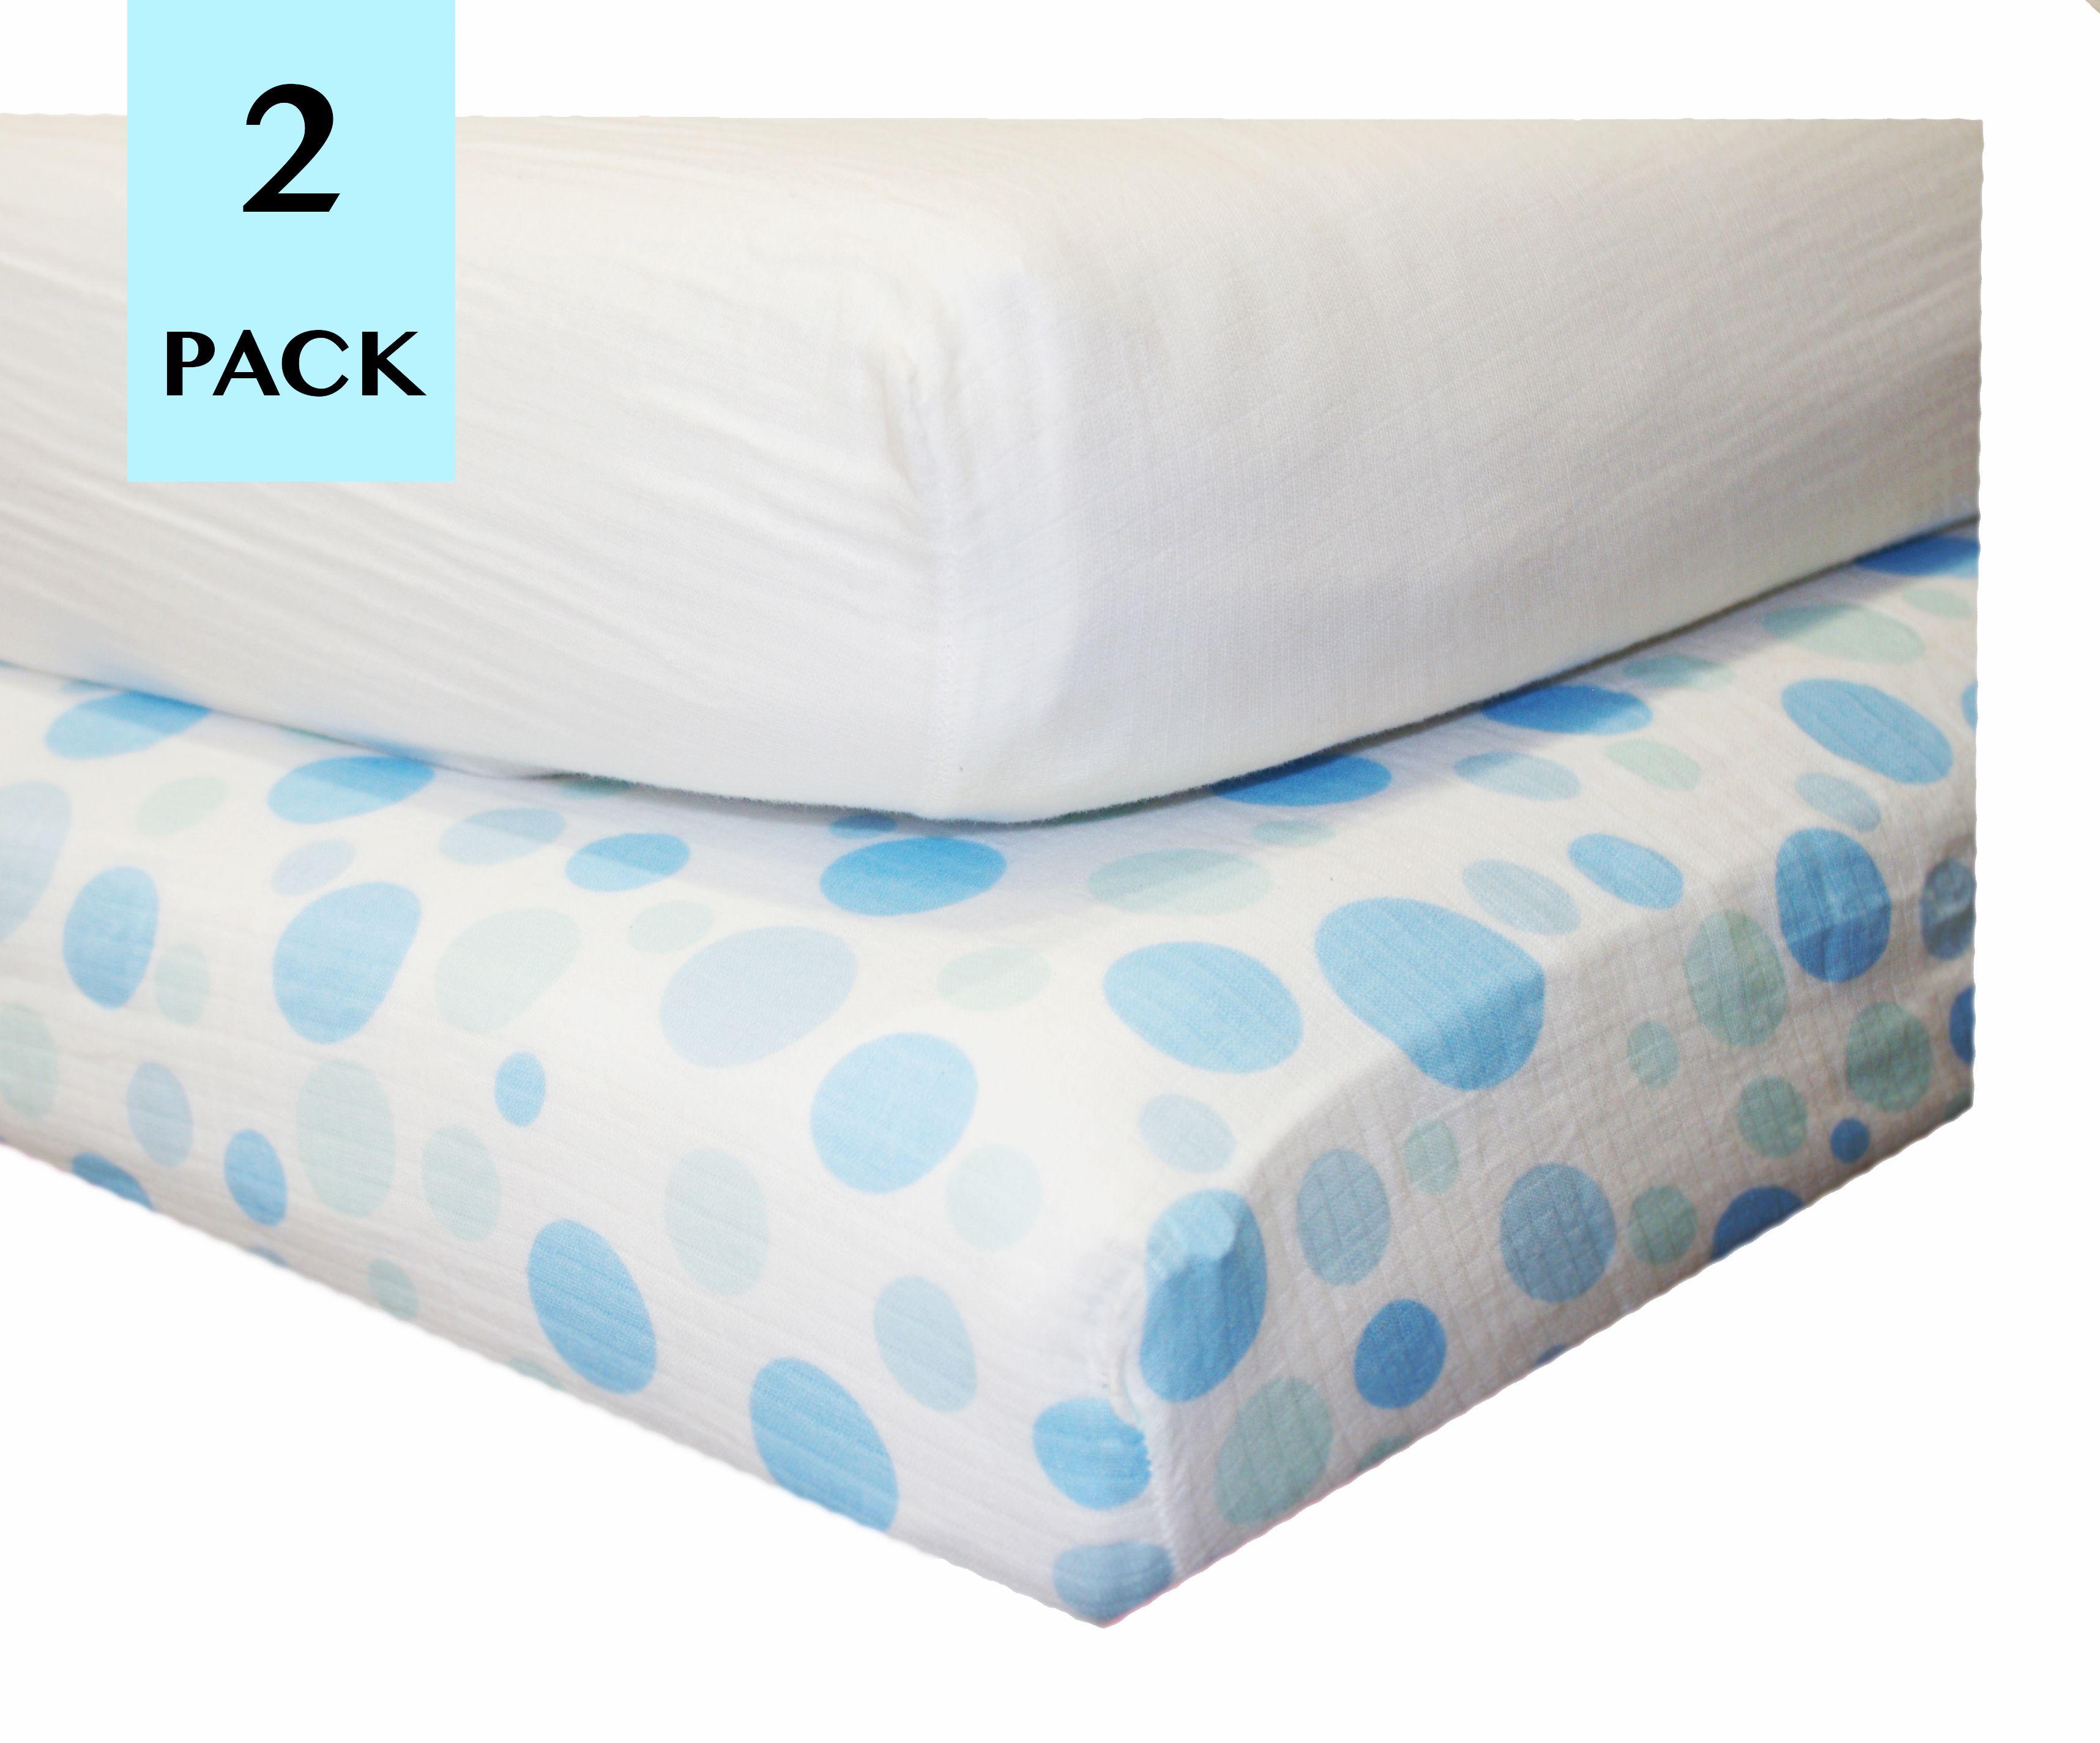 The Best Crib Sheets On Amazon Baby Crib Sheets Crib Sheets Cribs